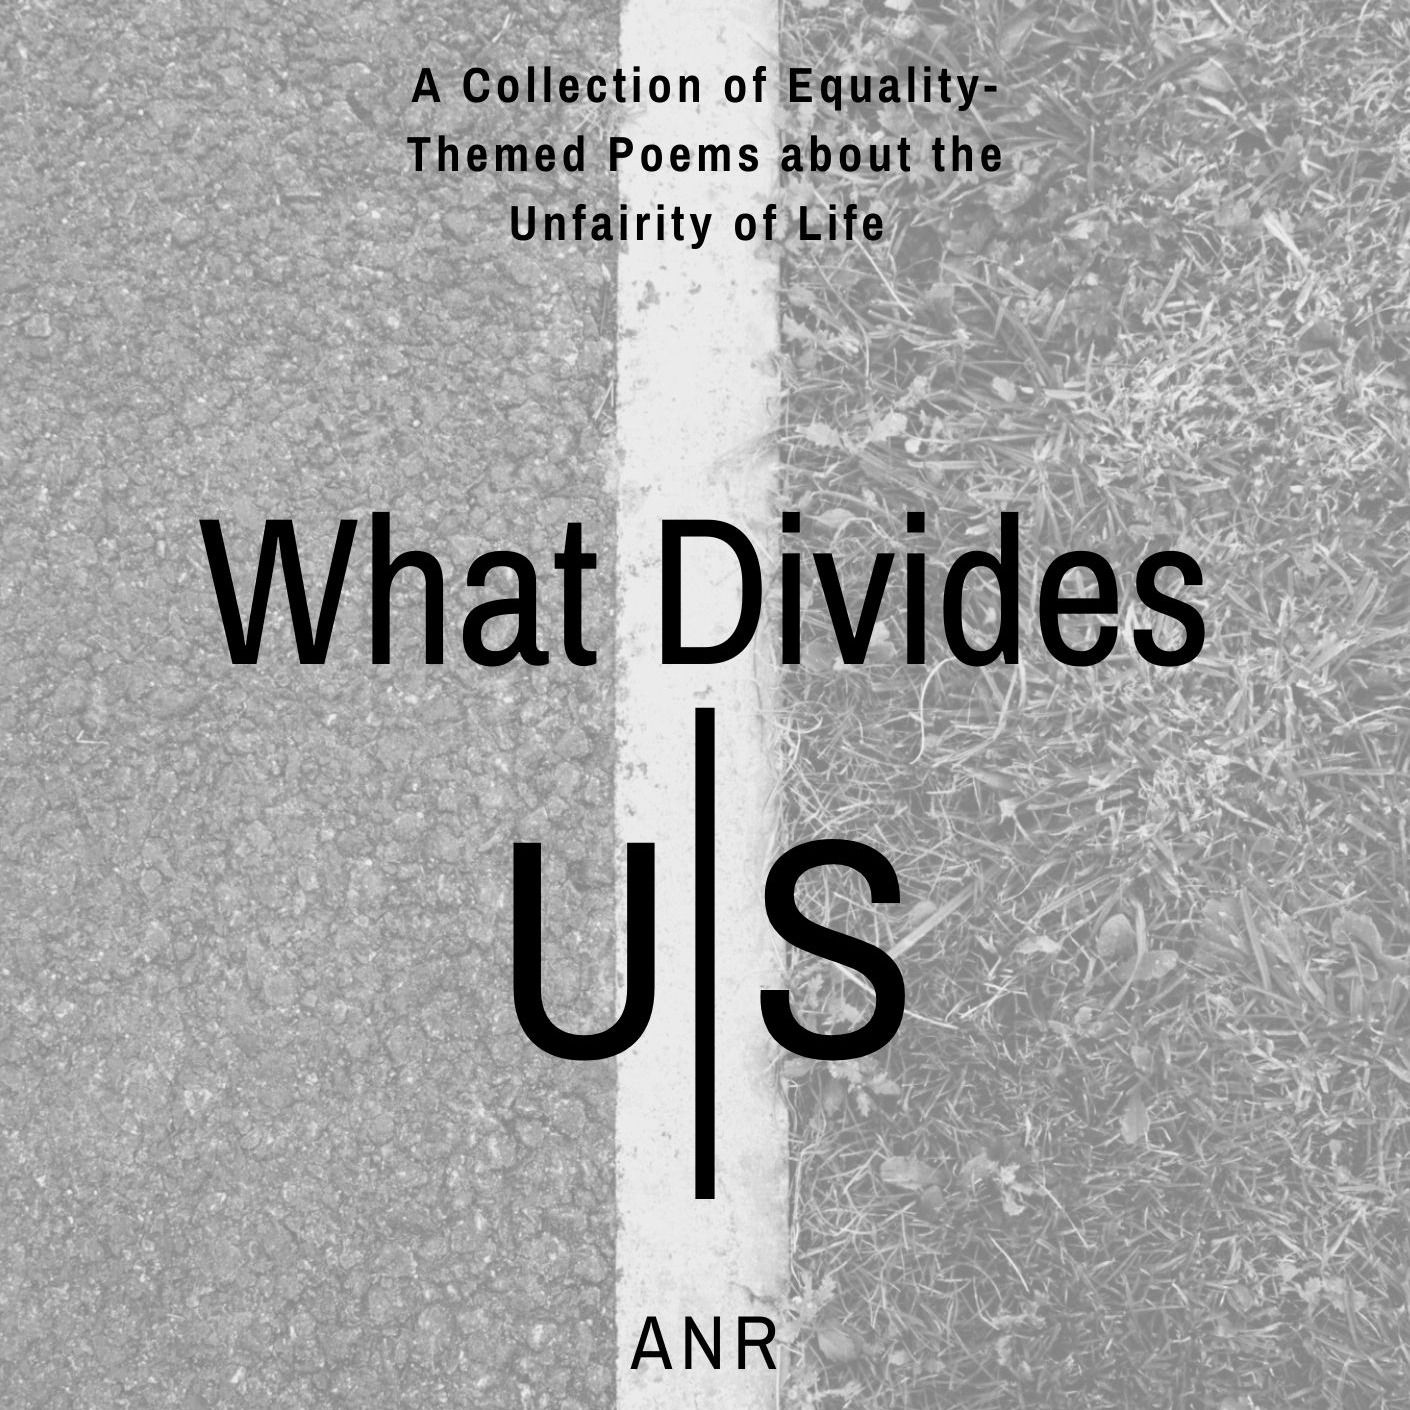 @WhatDividesUs Profile Image | Linktree